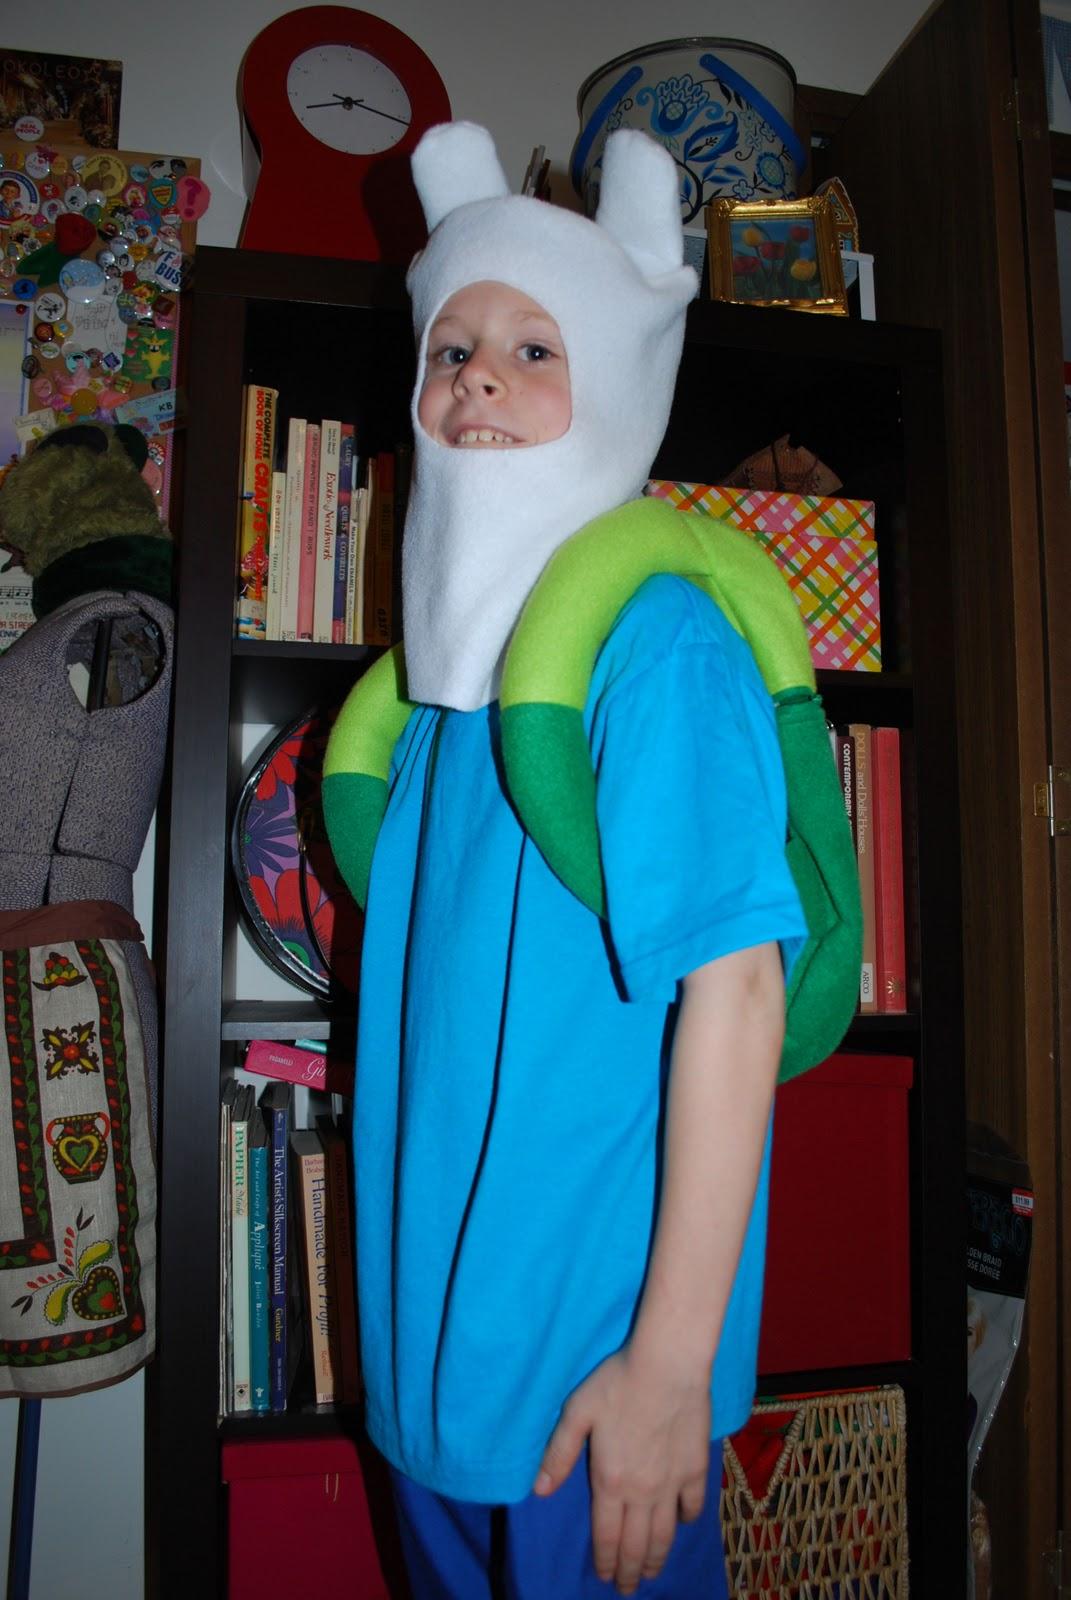 Finn adventure time costume